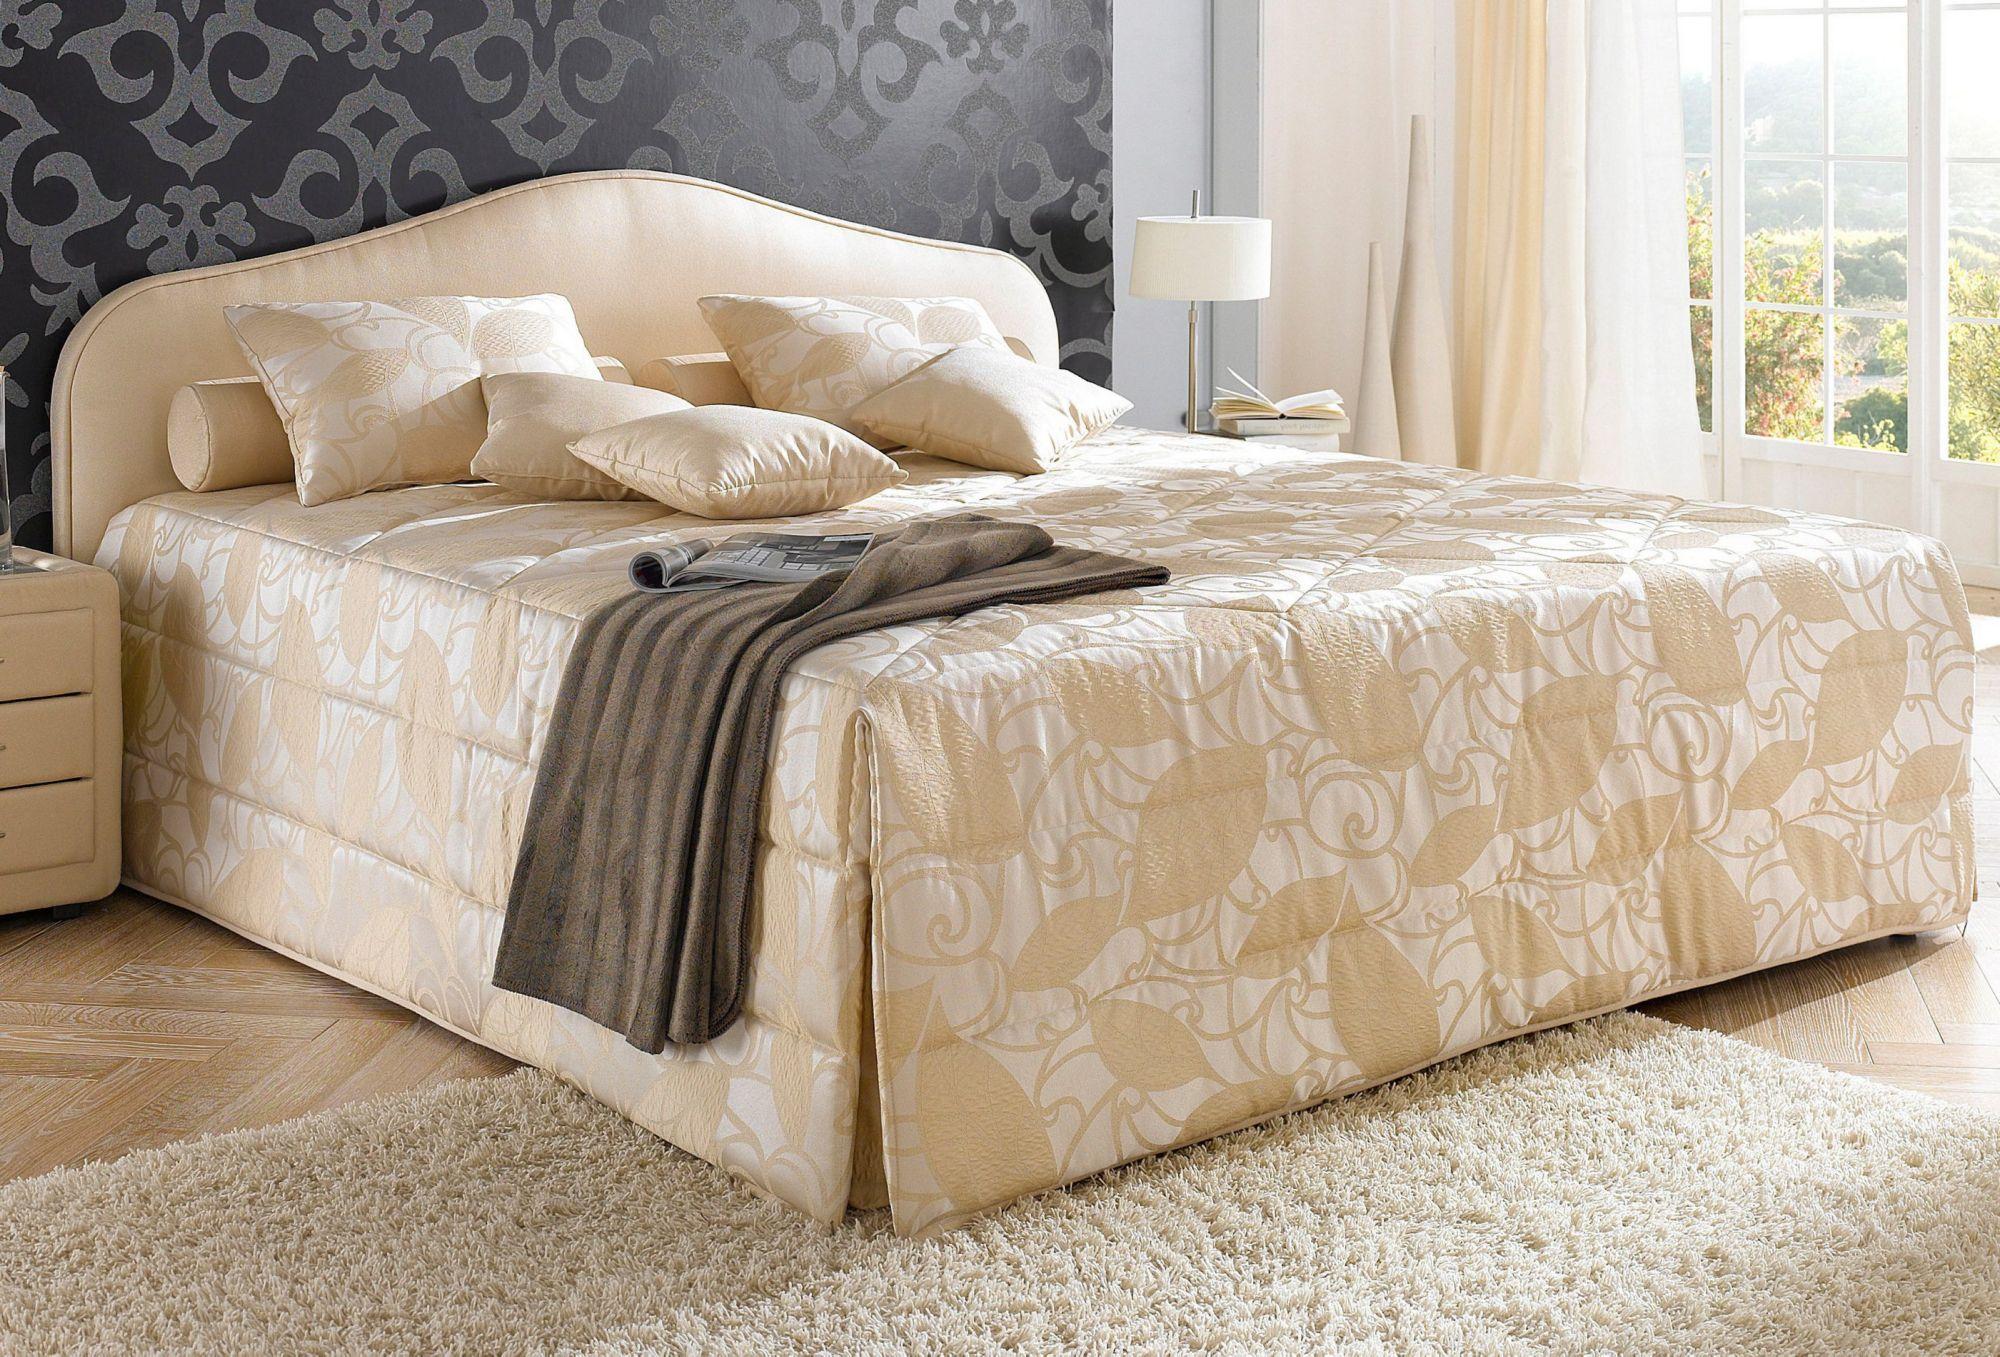 polsterbett maintal schwab versand betten mit bettkasten. Black Bedroom Furniture Sets. Home Design Ideas